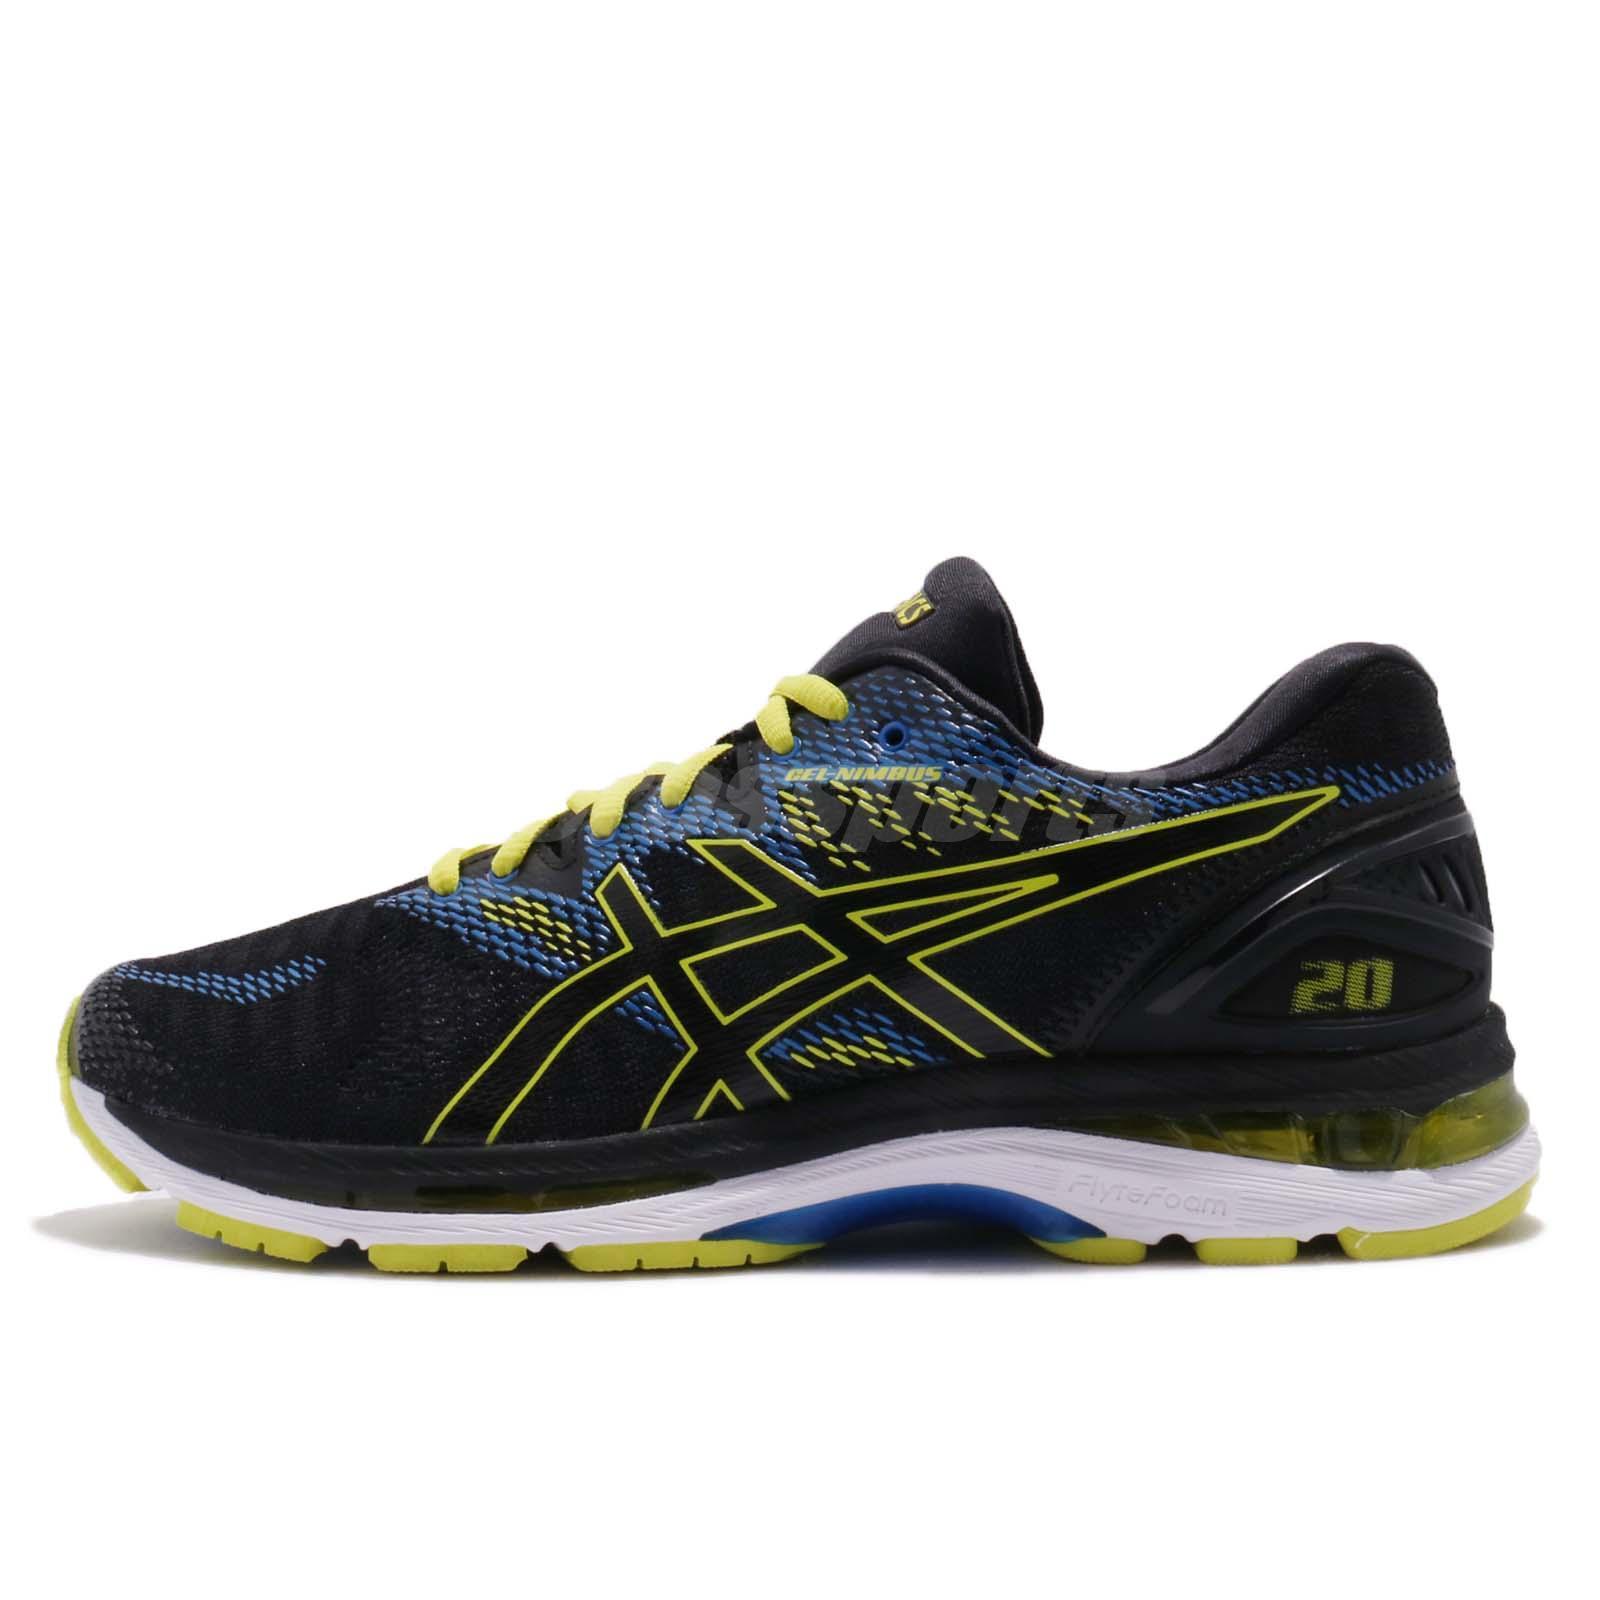 Asics Gel-Nimbus 20 Black Yellow Men Road Running Shoes Sneakers T800N-9089 28a379fbb1876